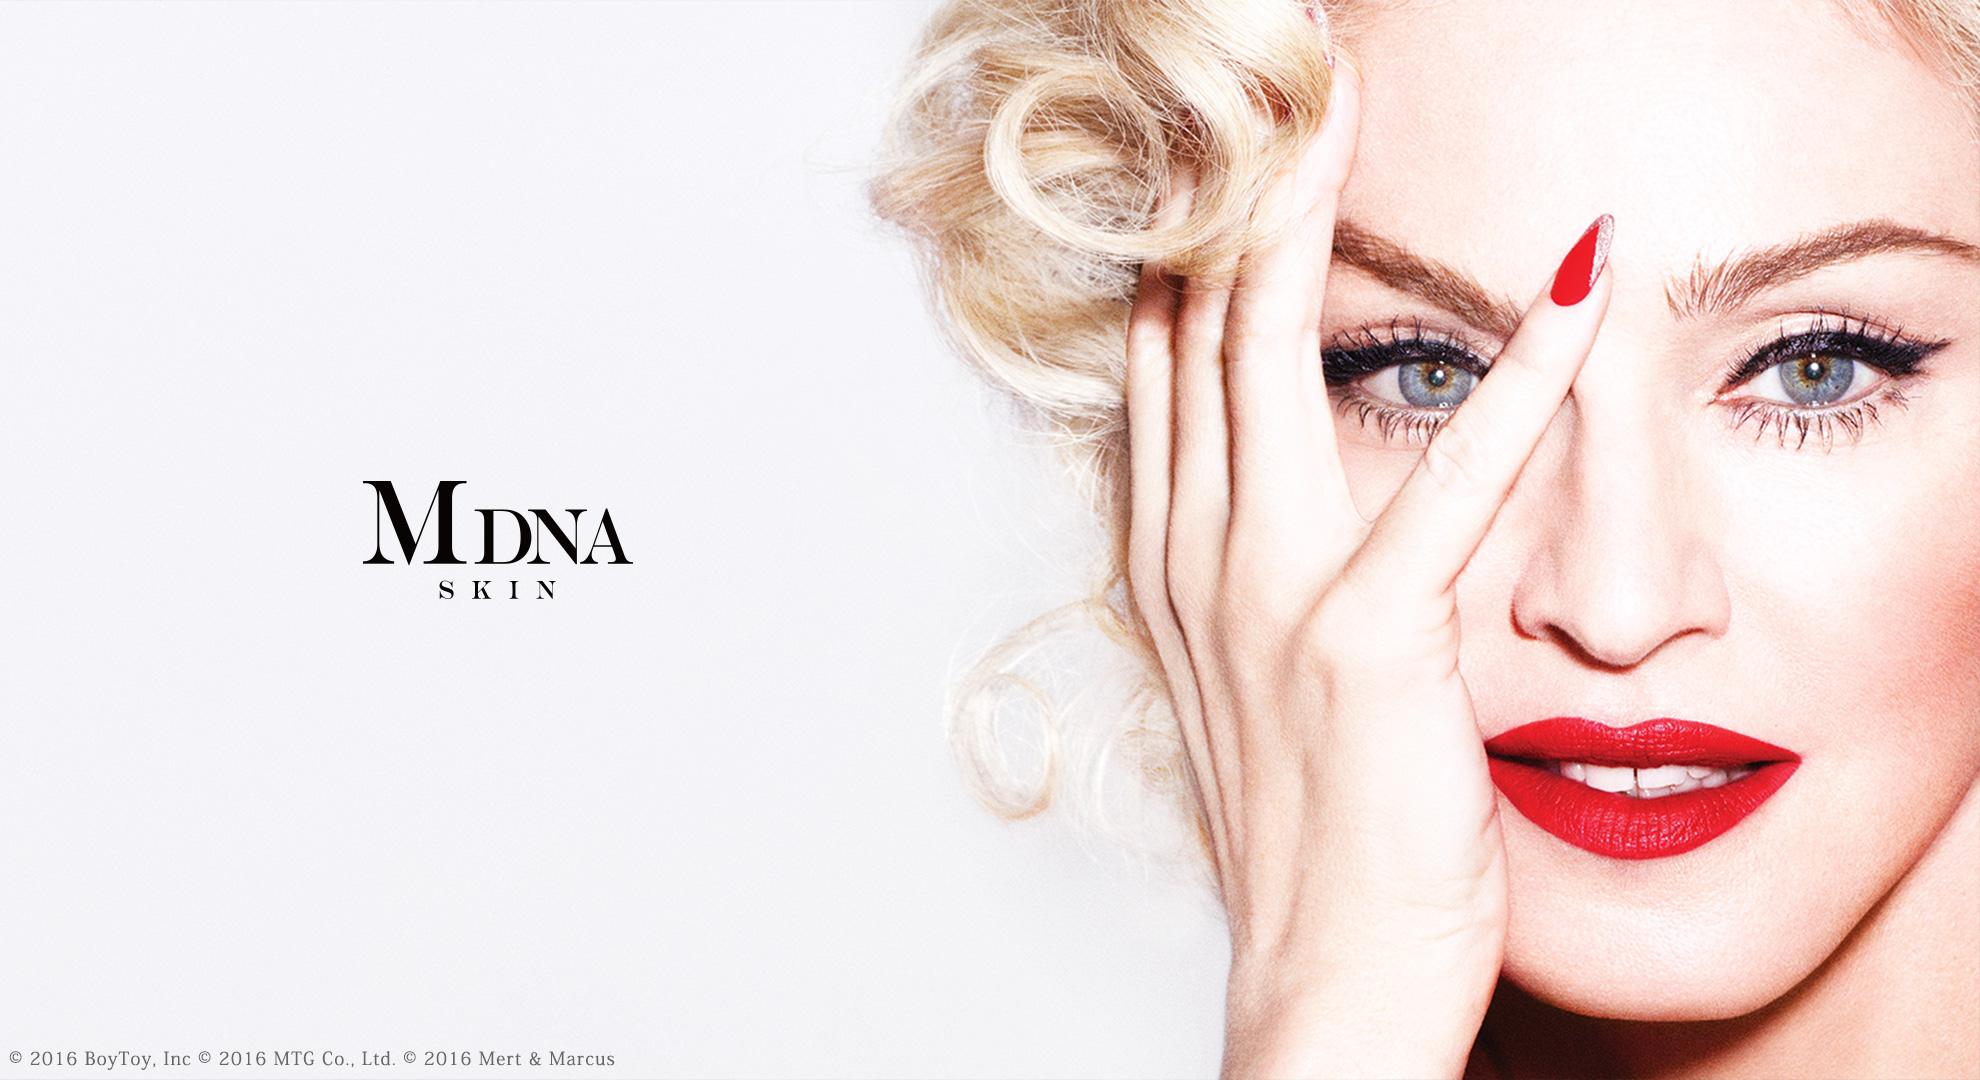 MDNA Skin By madonna (3)